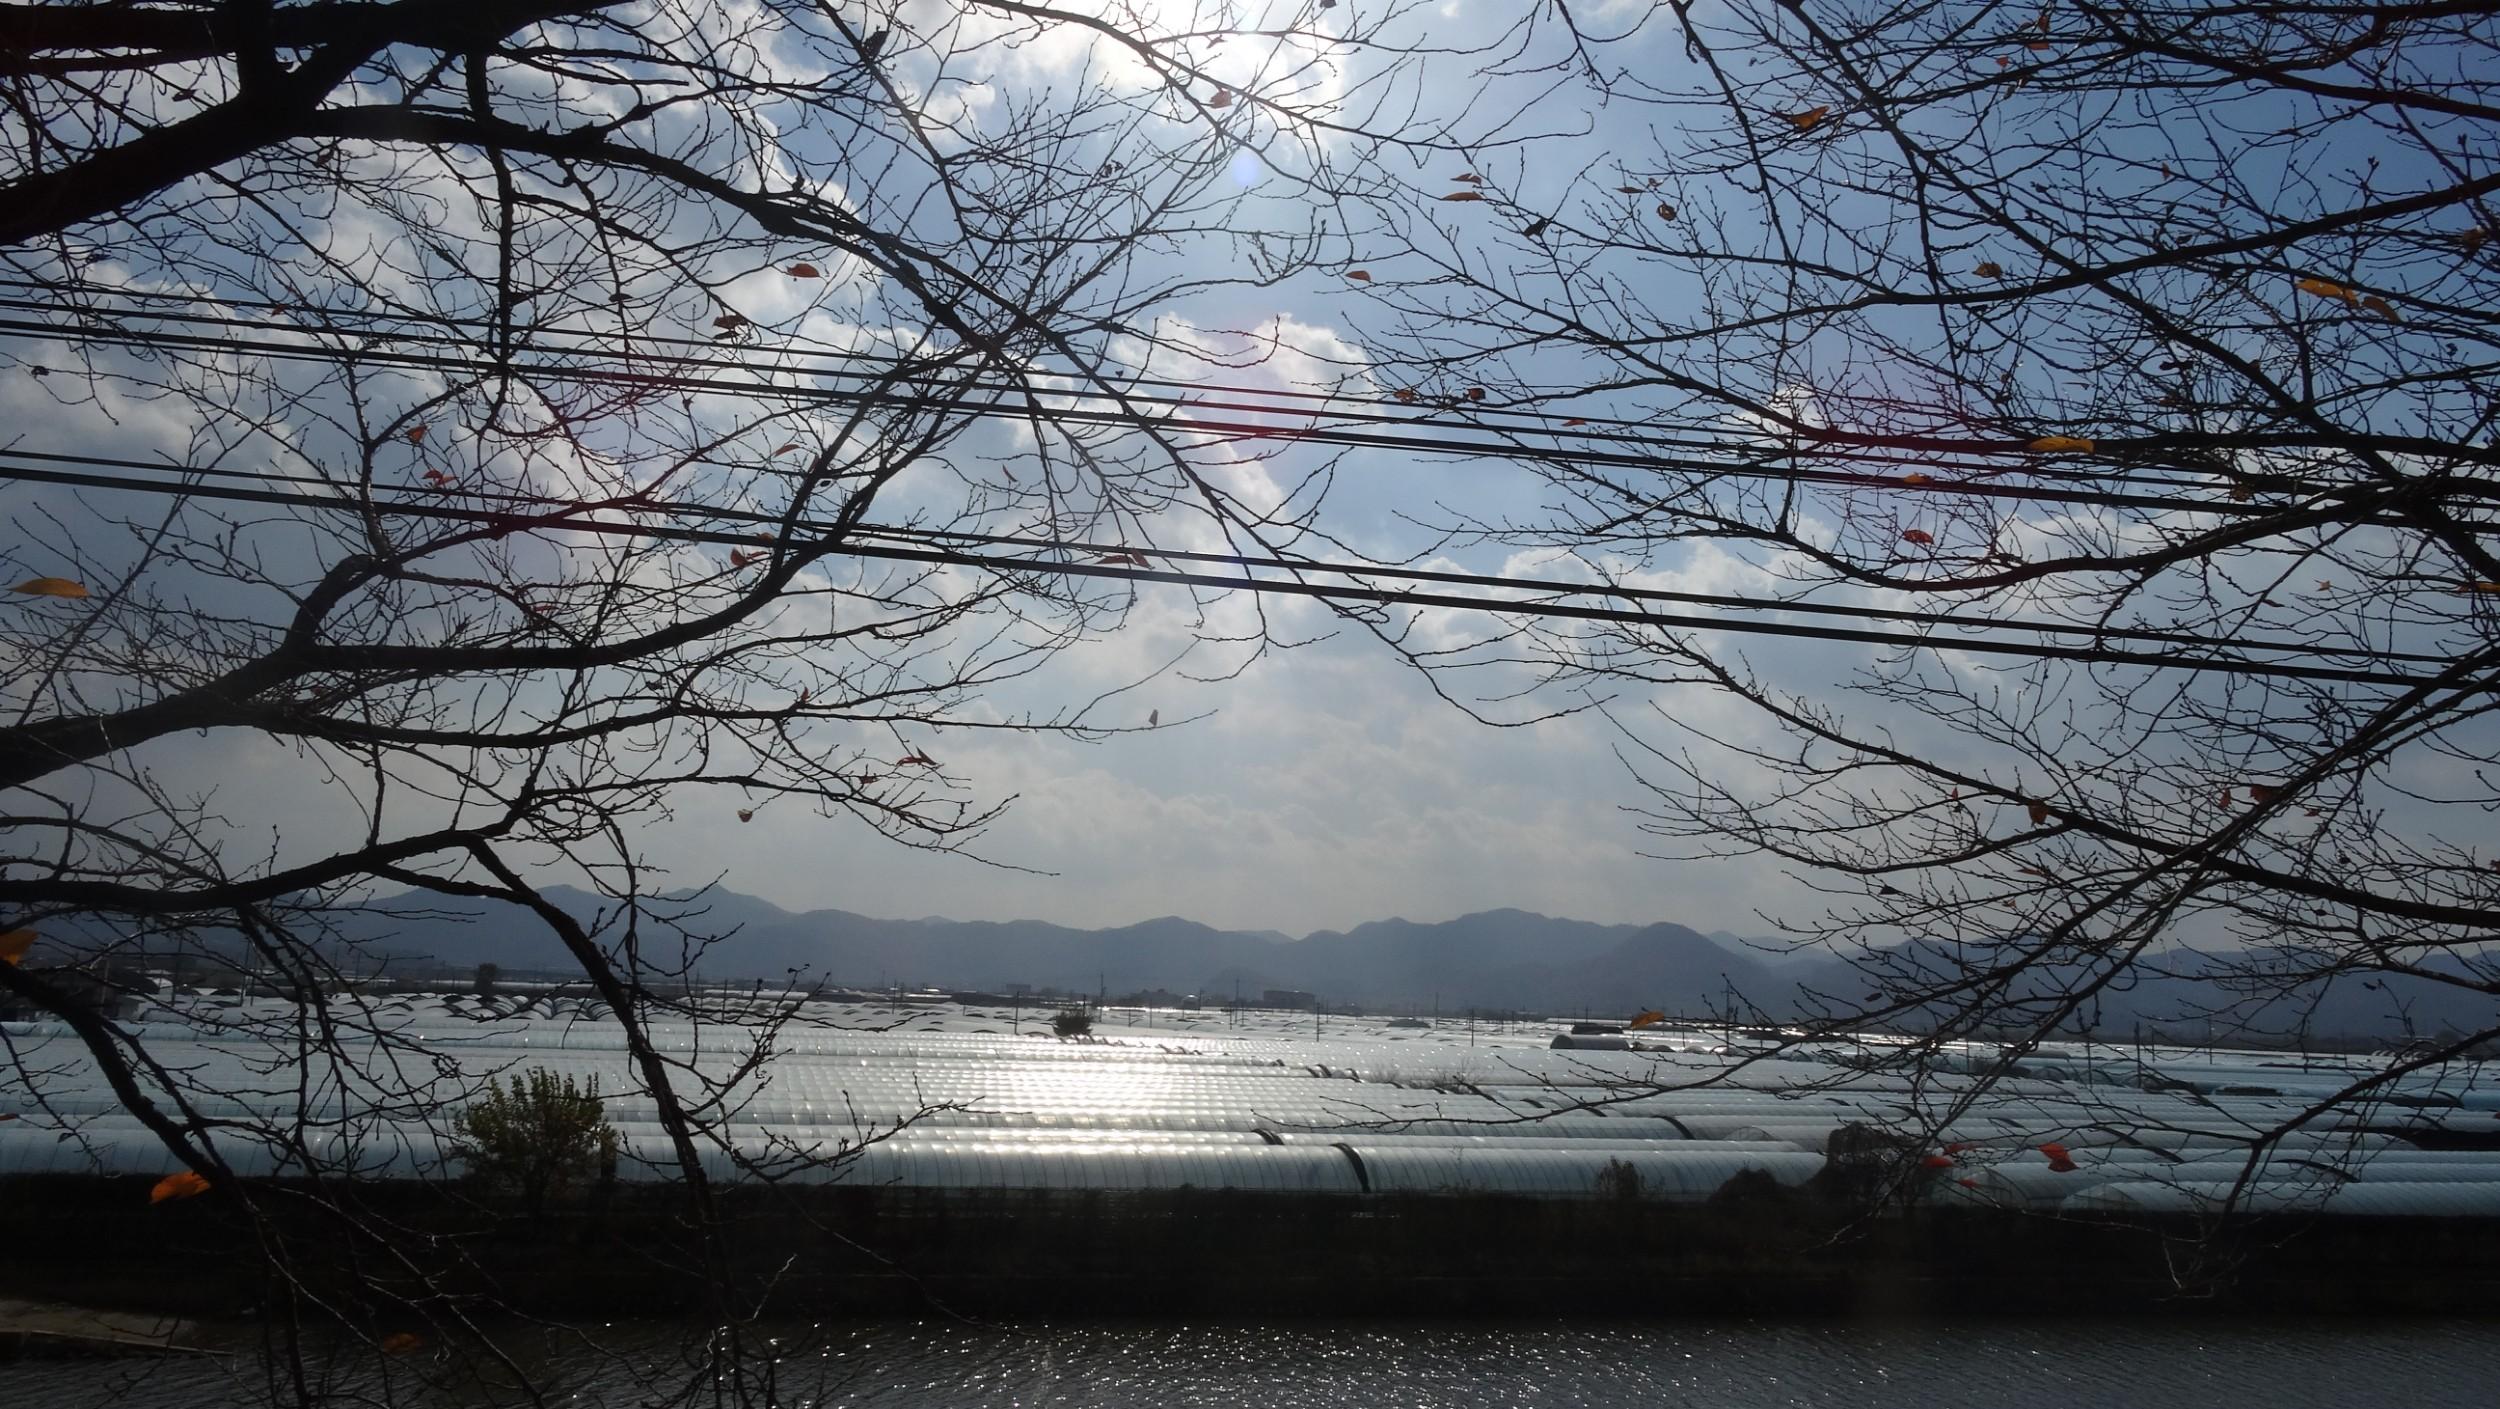 sceneDSC05462.JPG